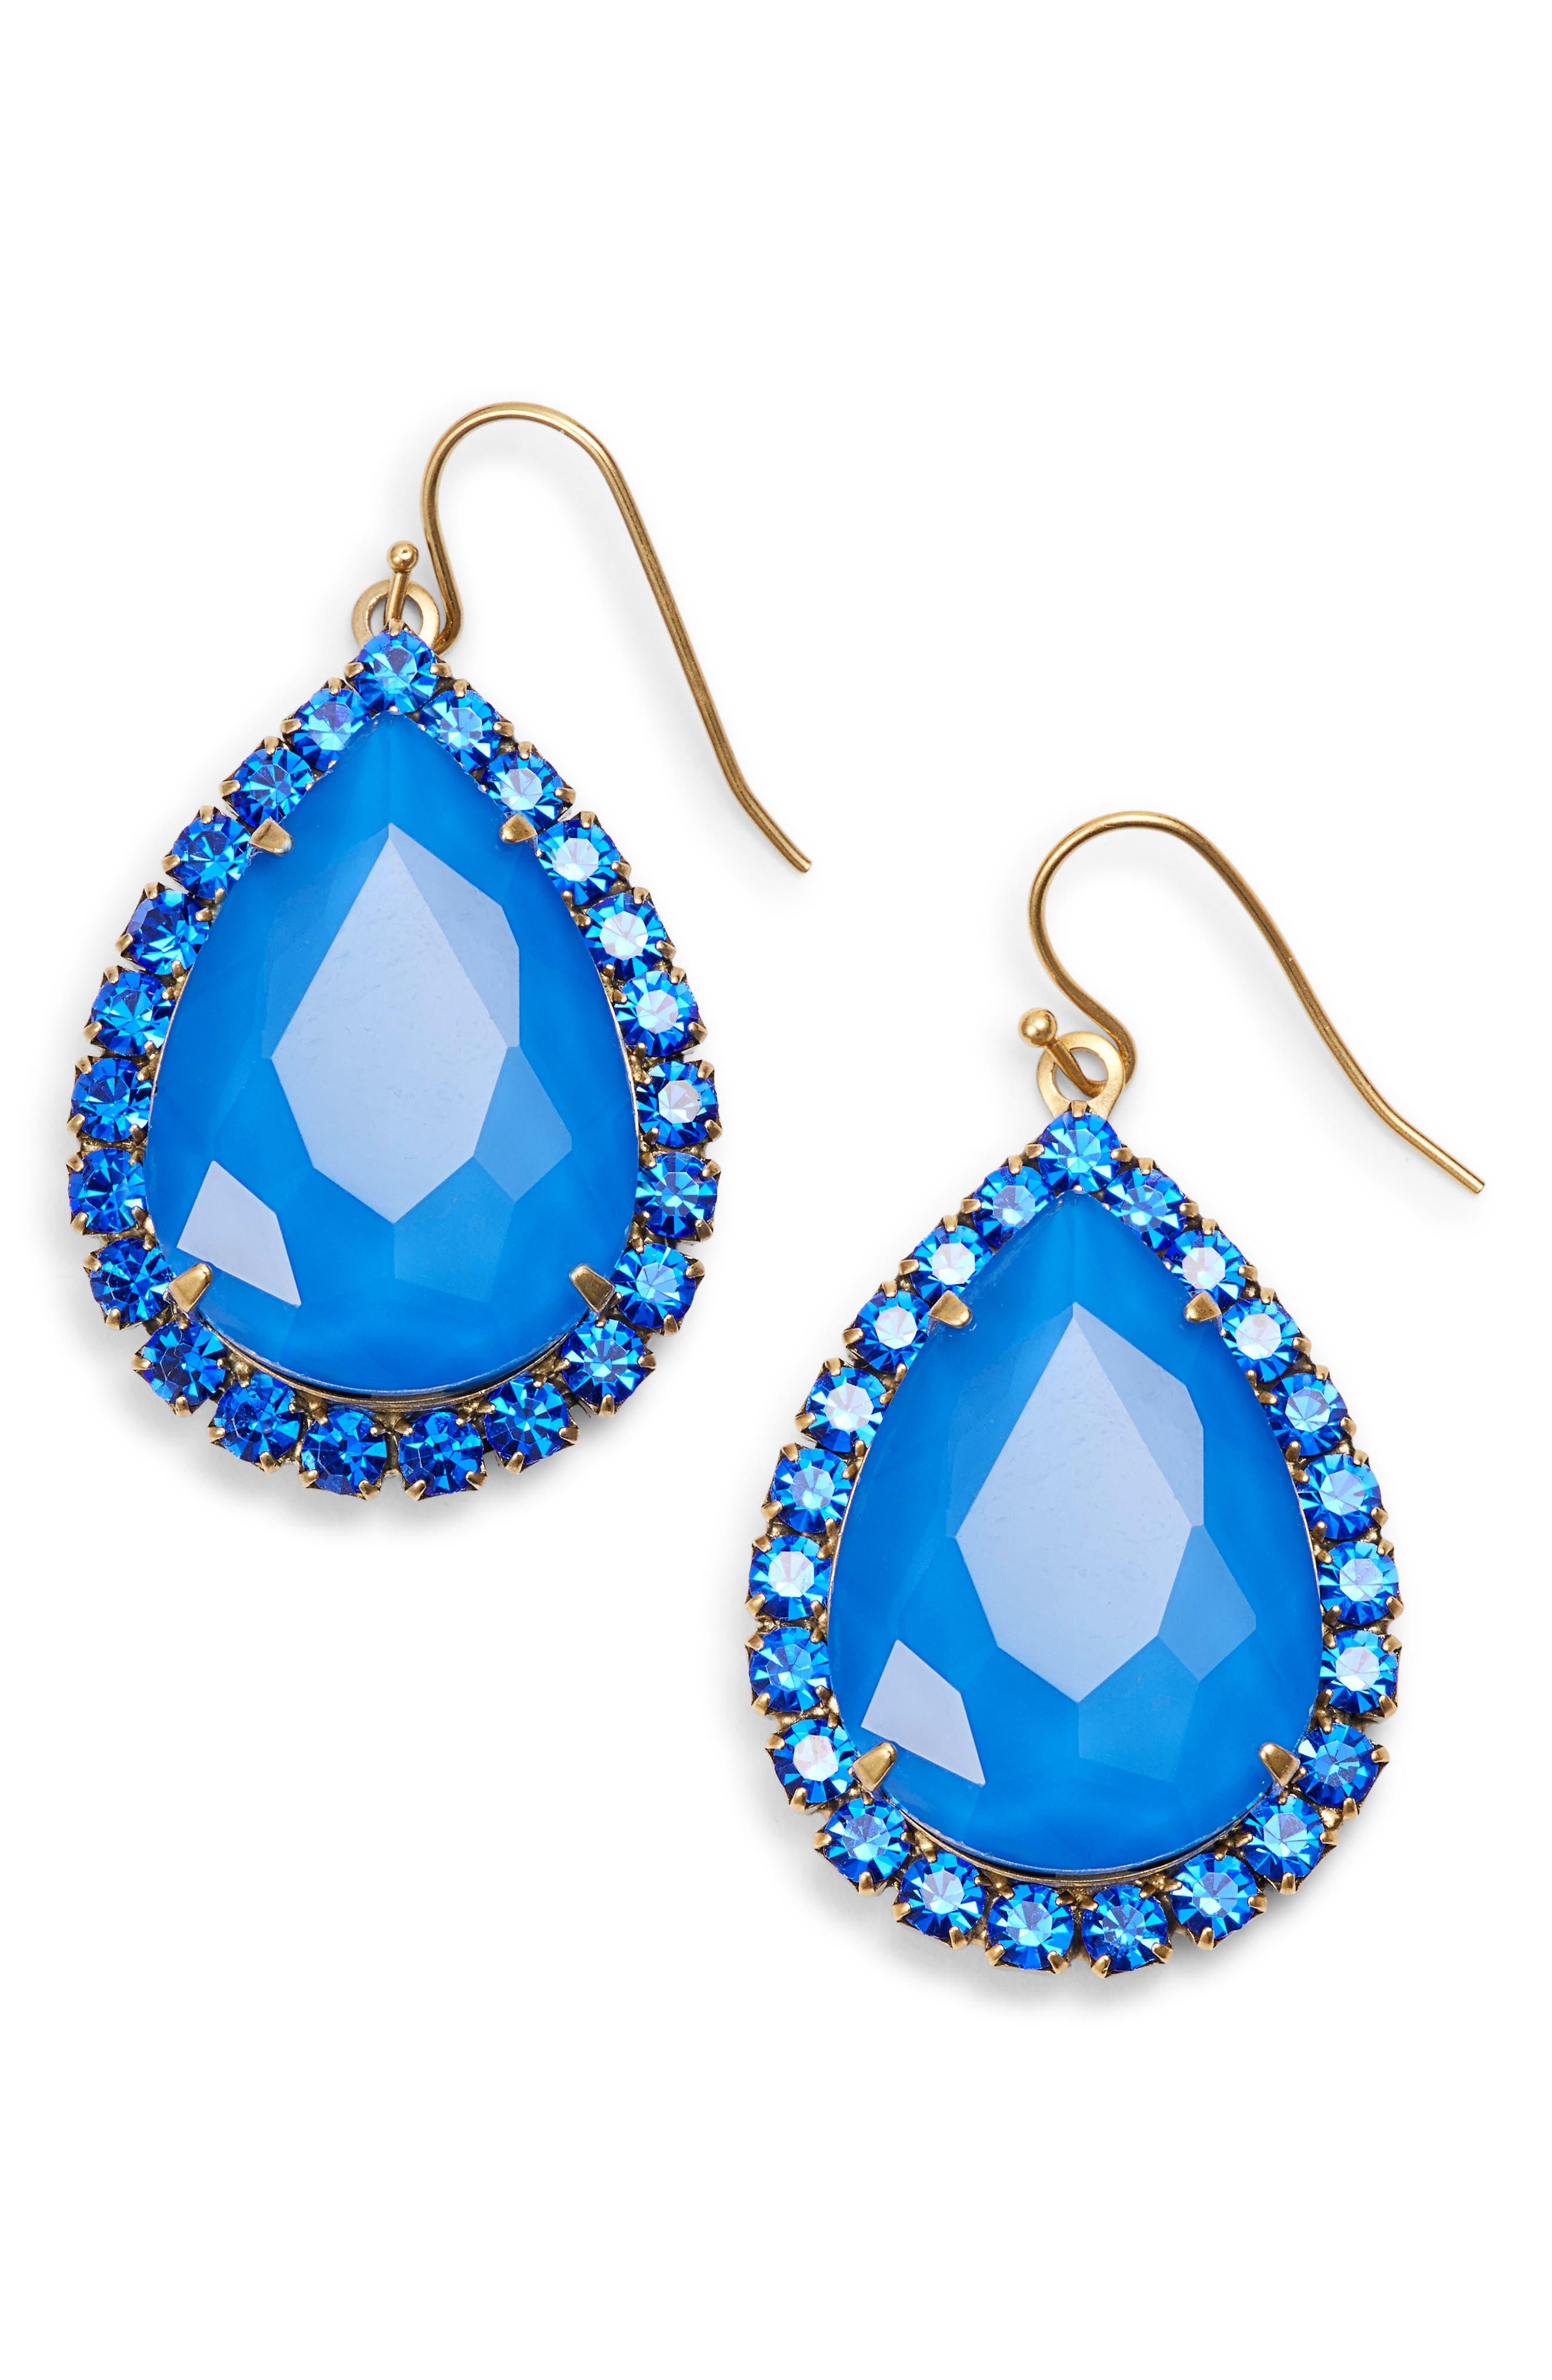 Main Image - Loren Hope Krista Crystal Drop Earrings